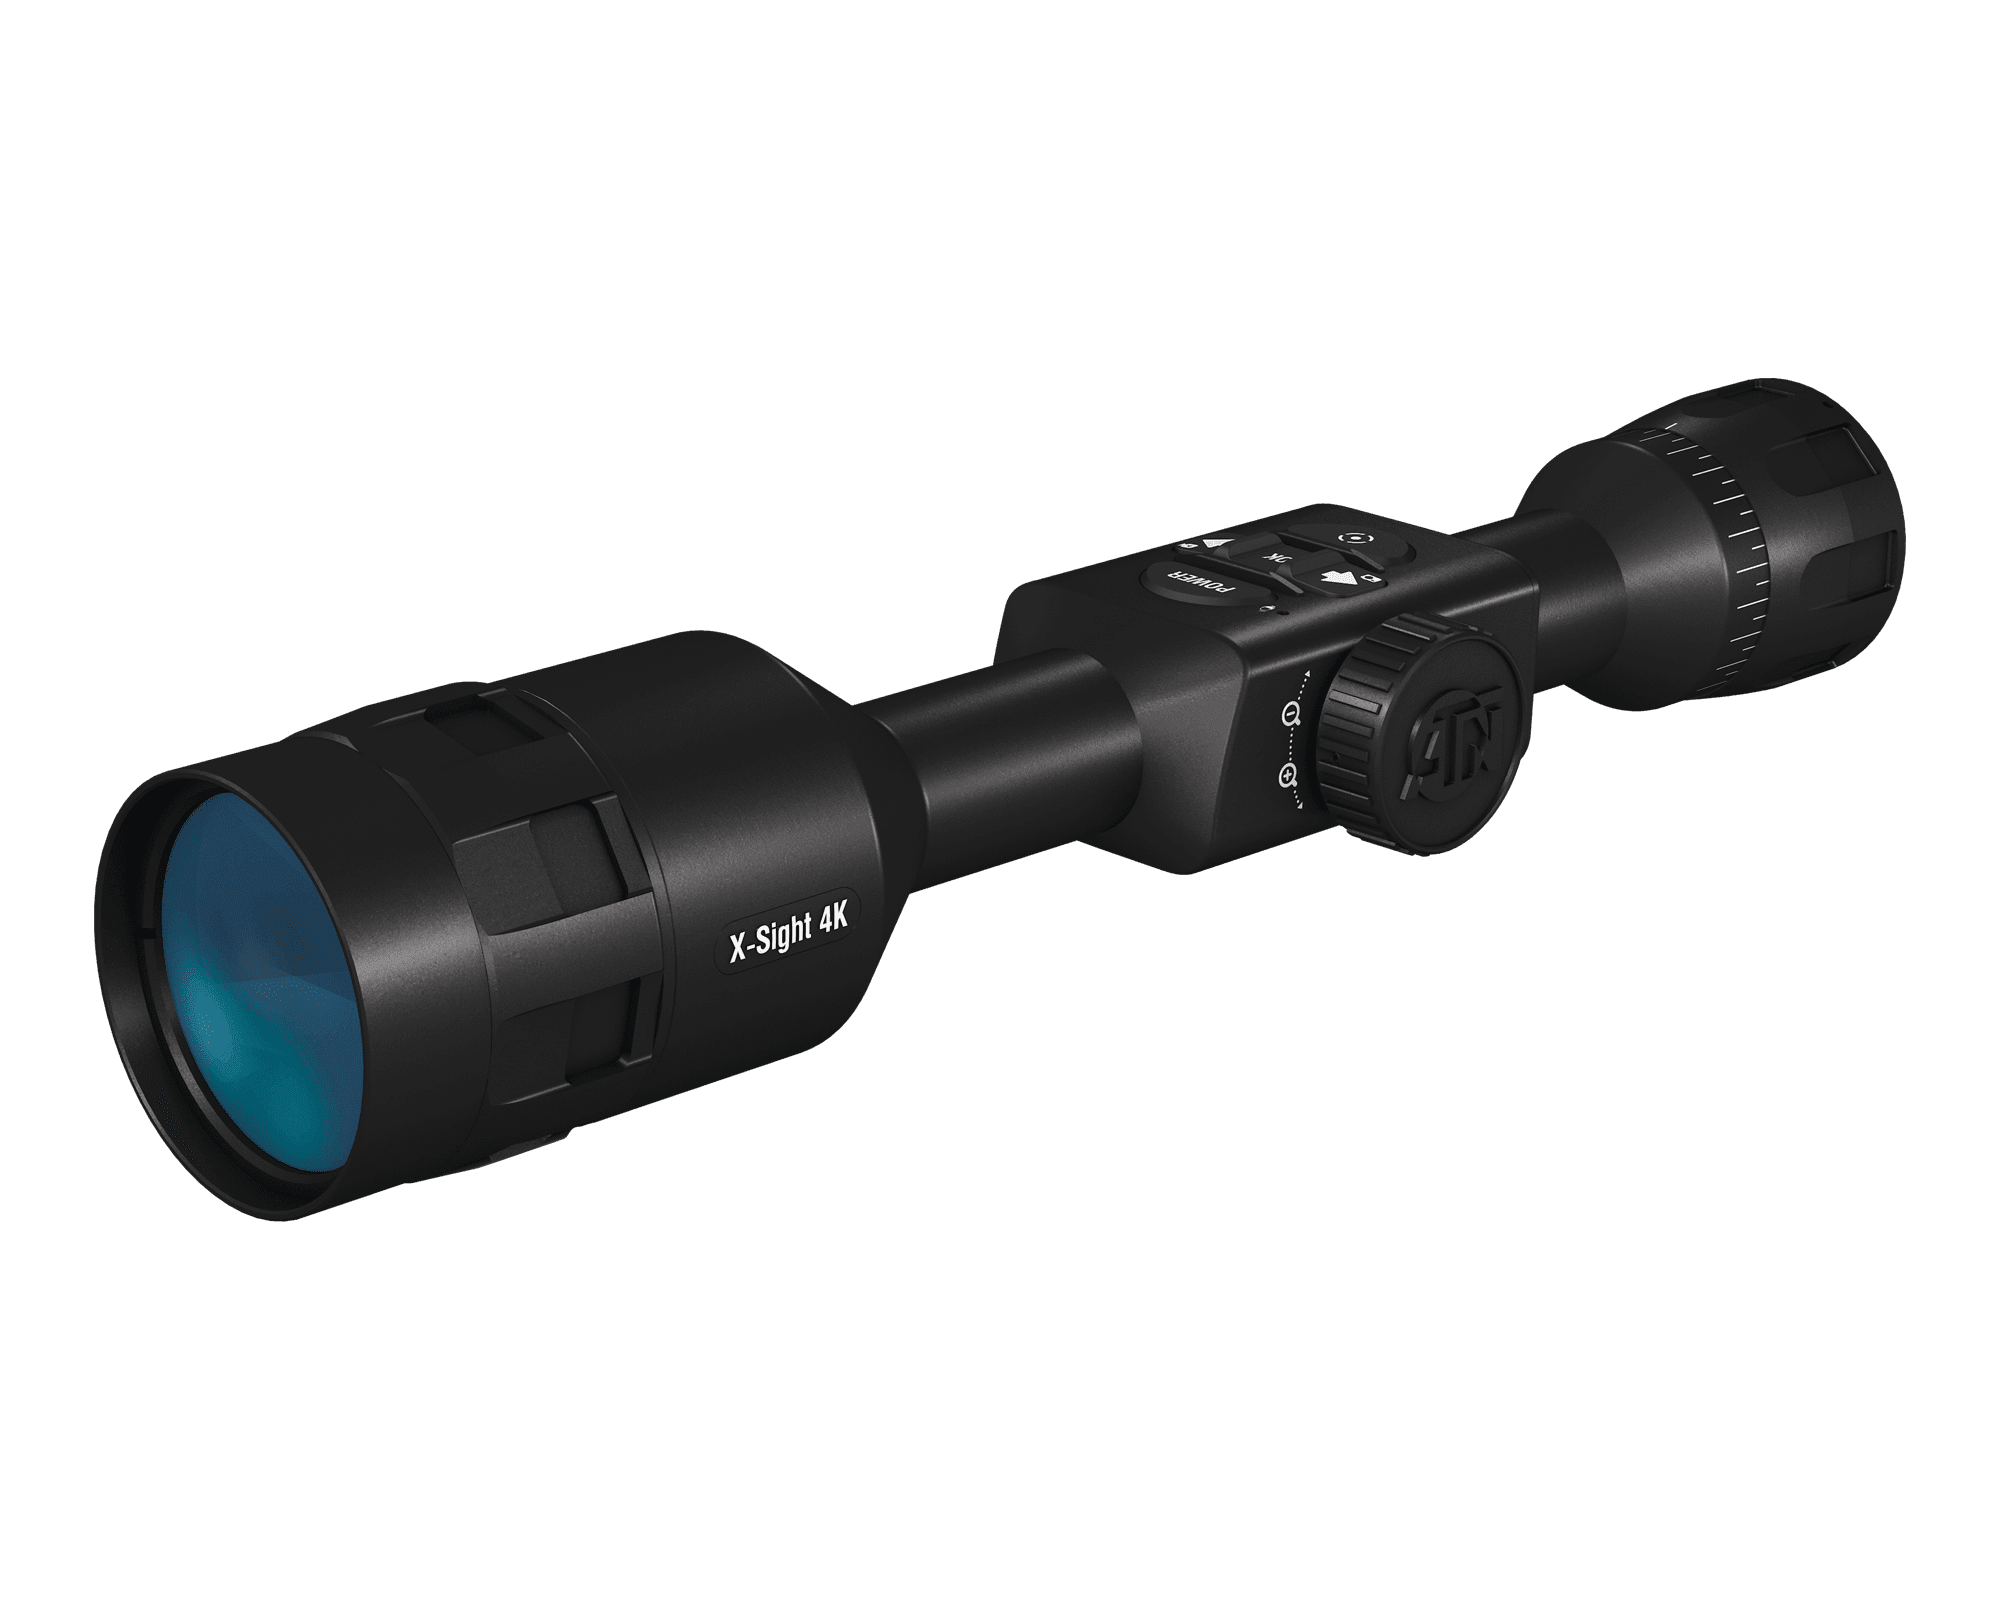 X-Sight 4k Pro 3-14